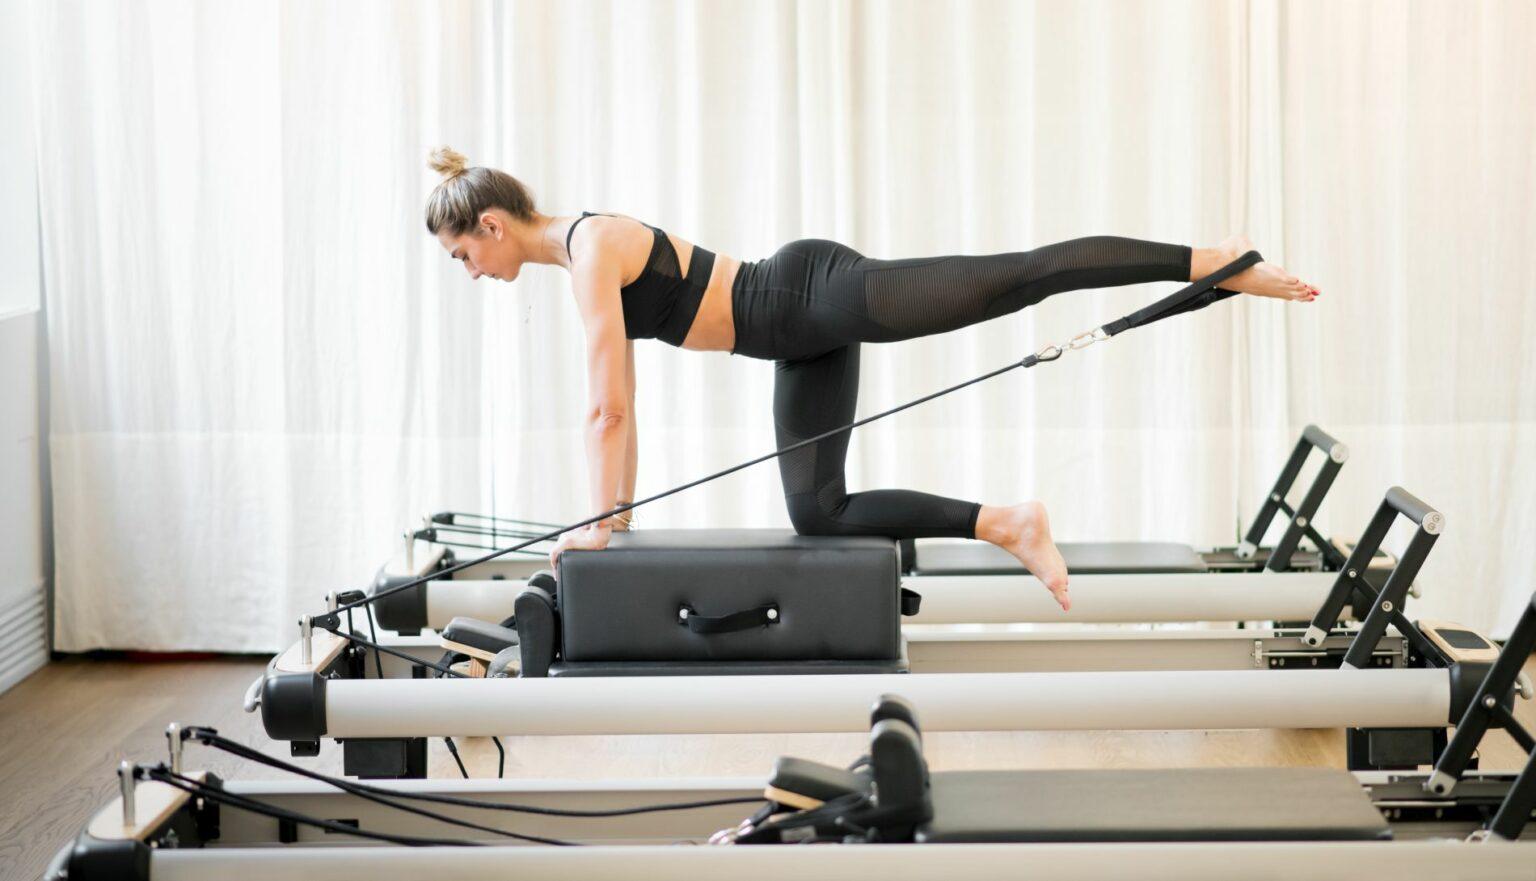 Woman performing a pilates diagonal stabilisation